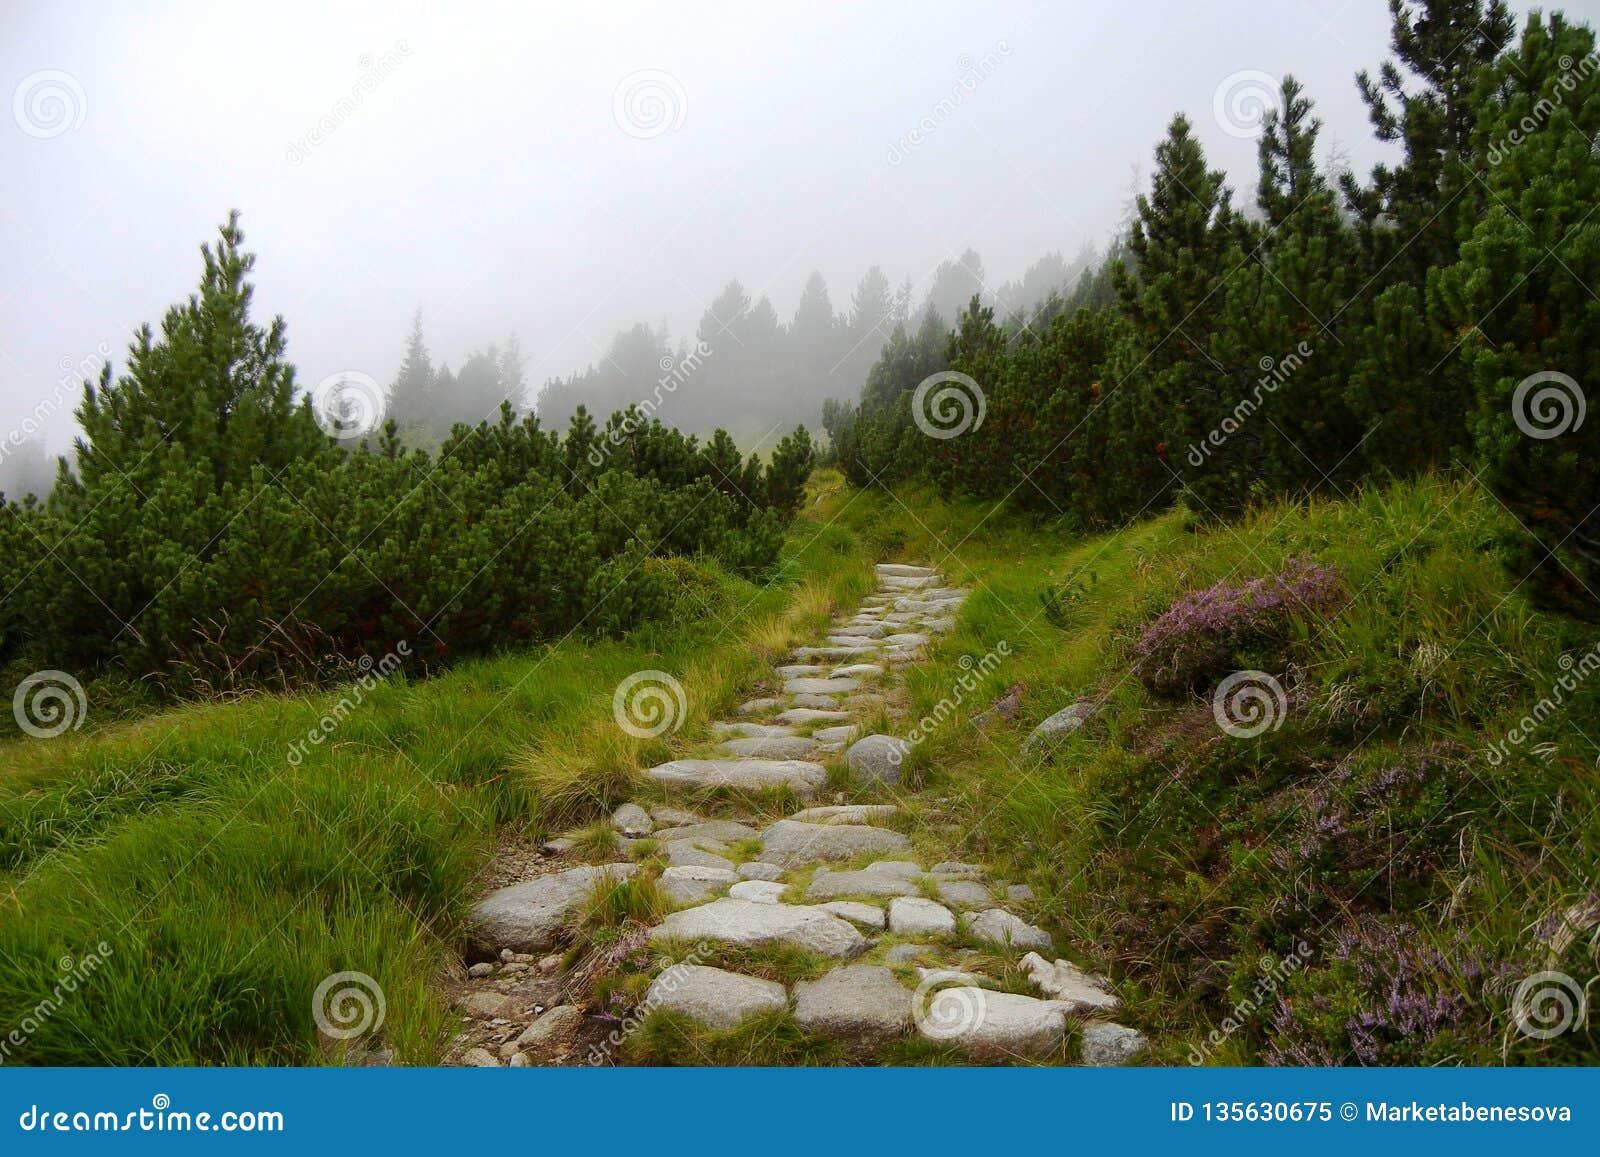 Stone path in Tatra mountains